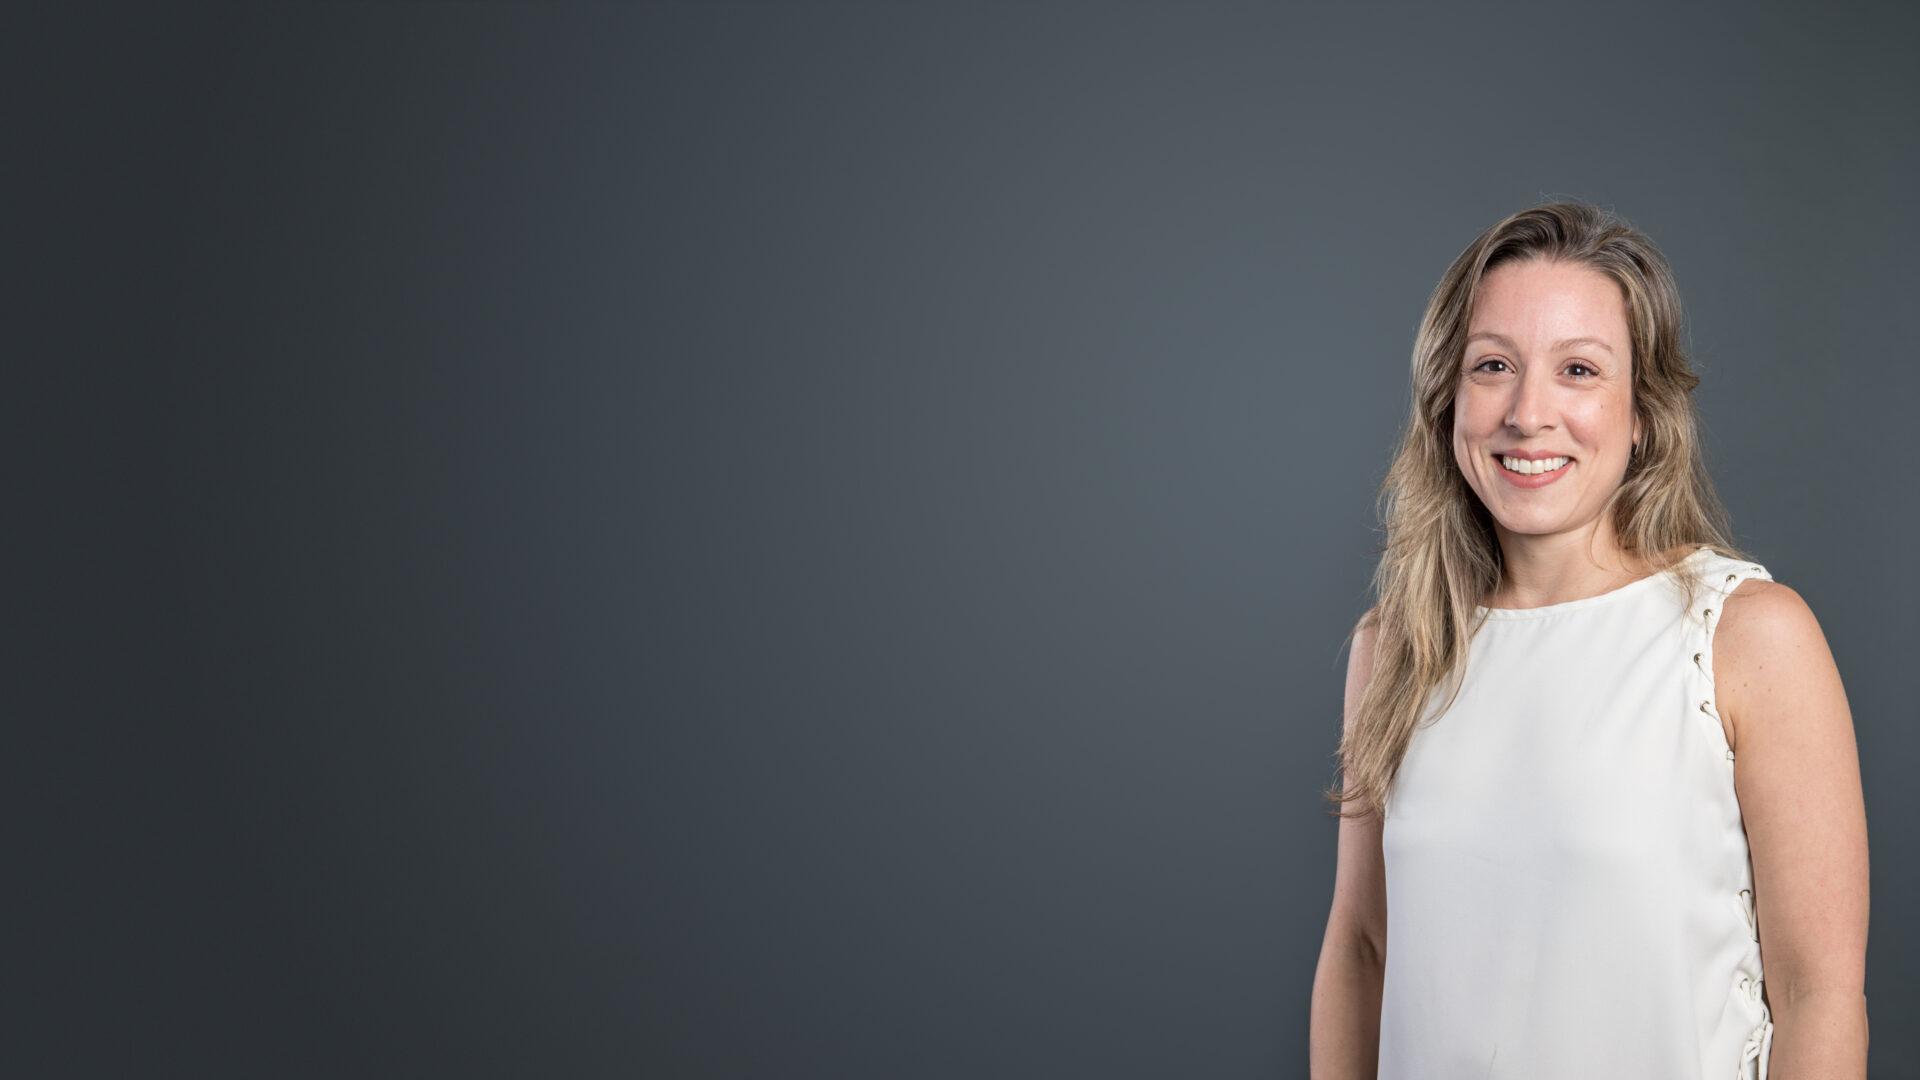 Daniela Duque Estrada